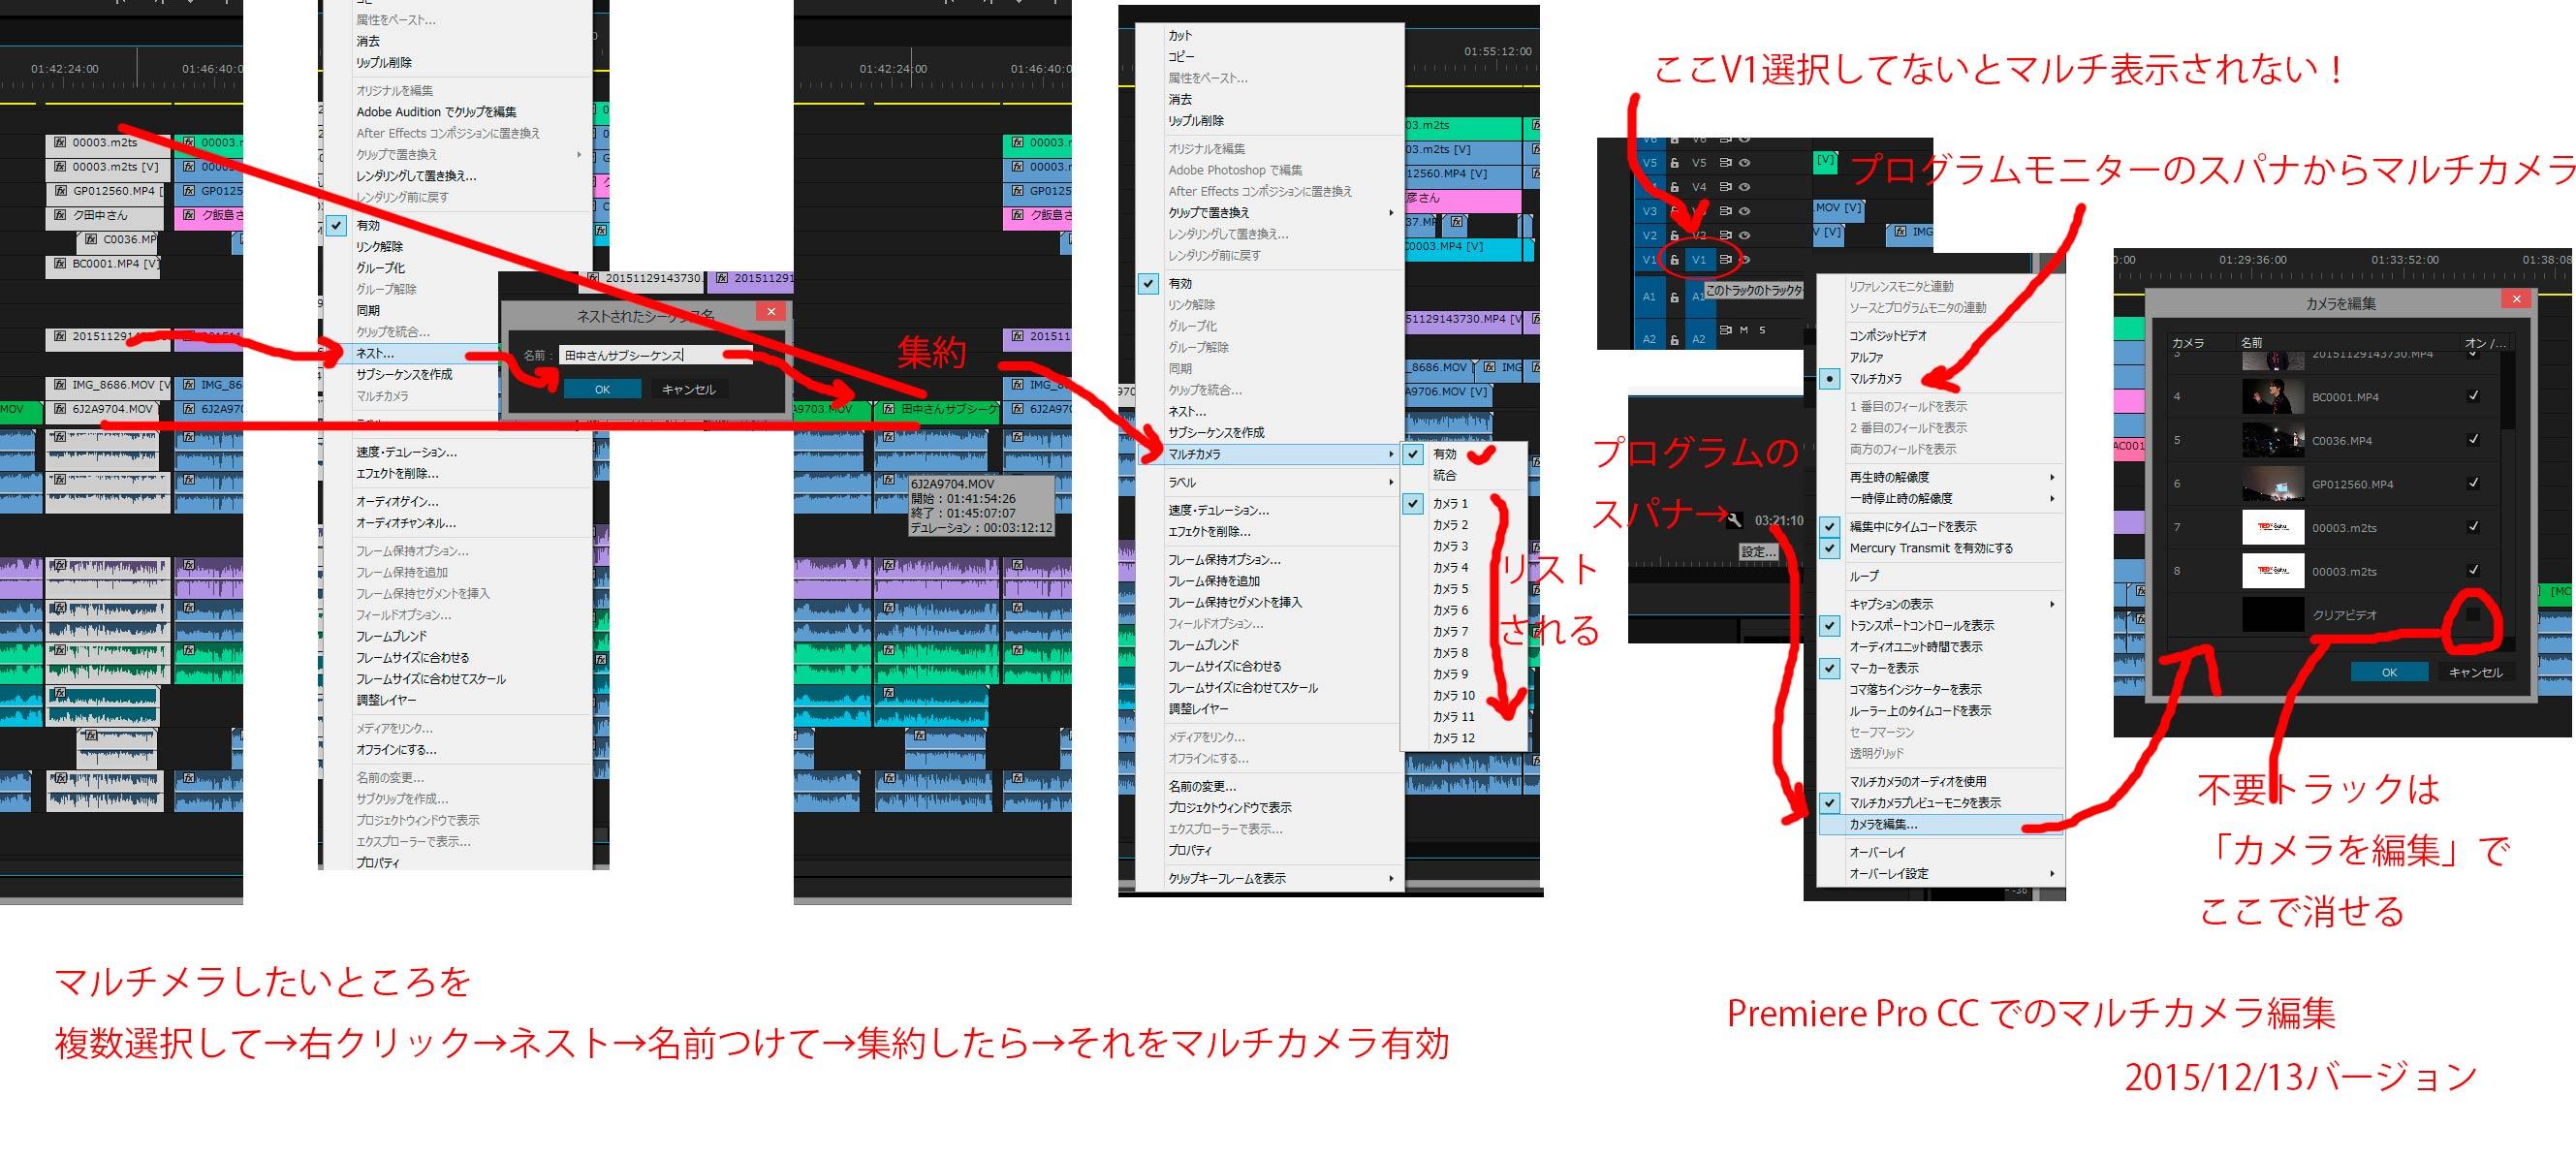 Premiere Pro CC でのマルチカメラの編集方法を整理してみました。_a0032346_6594263.jpg